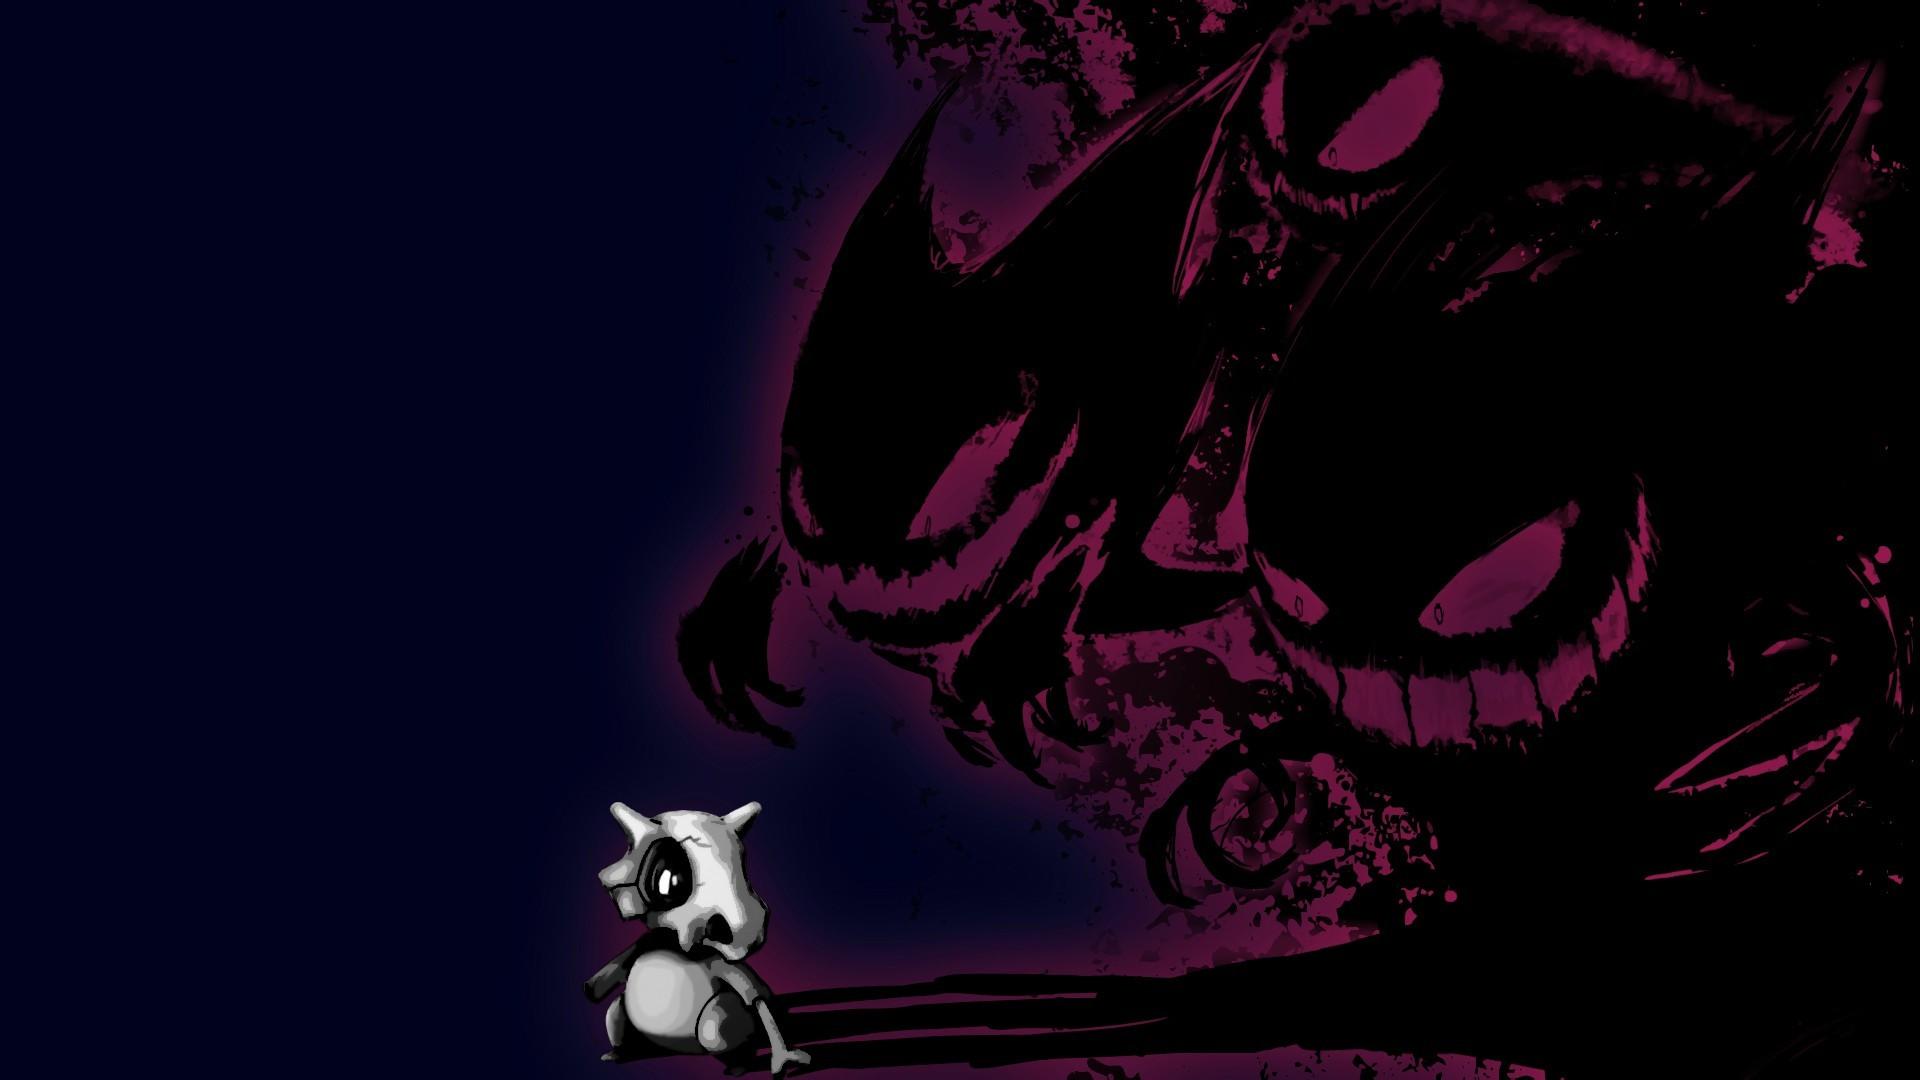 Collectionddwn Dark Pokemon Wallpaper